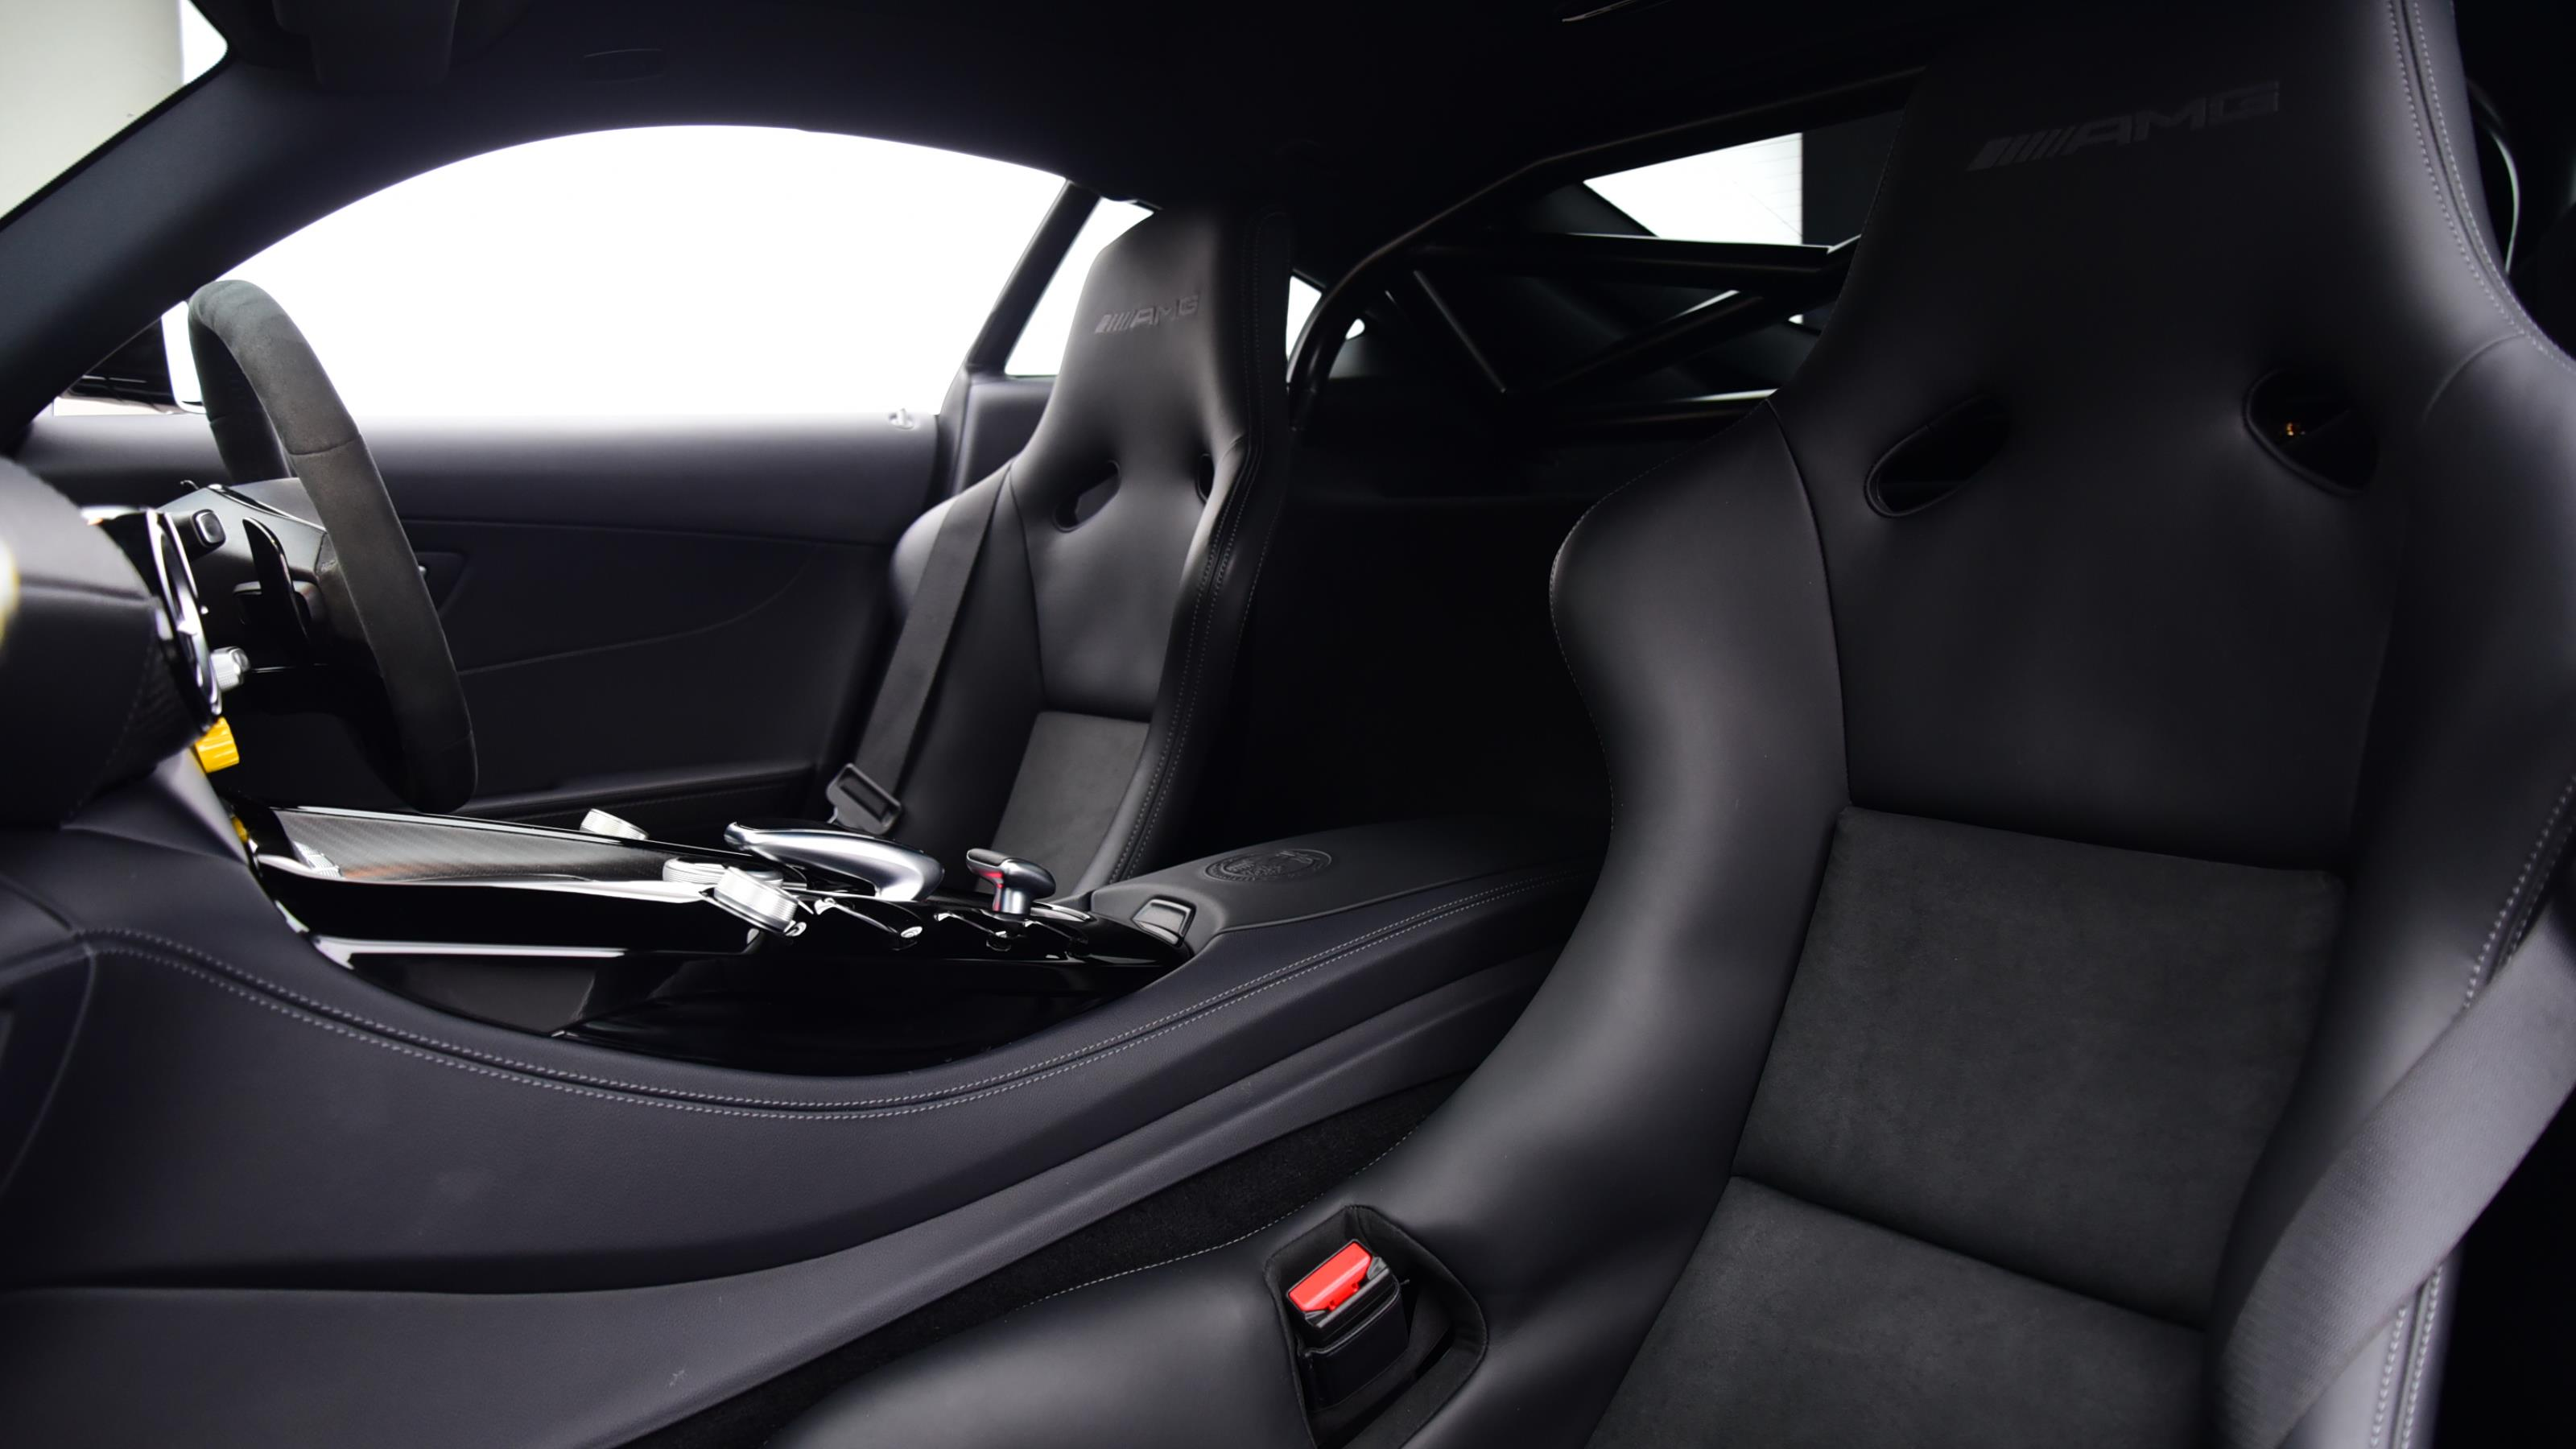 Used 2018 Mercedes-Benz AMG GT GT R Premium 2dr Auto BLACK at Saxton4x4